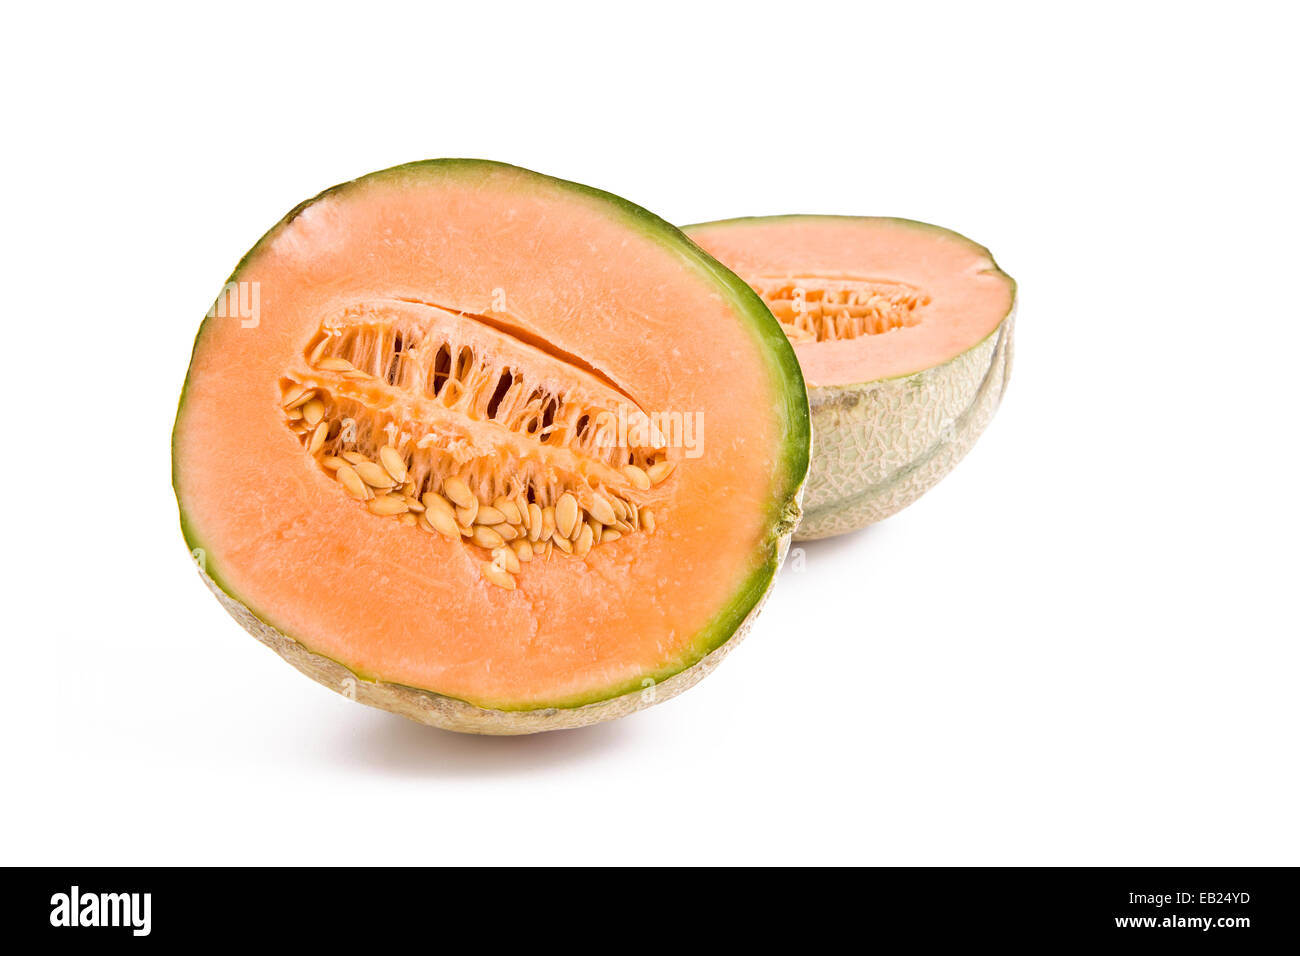 Tranches de melon cantaloup frais isolé sur fond blanc, les fruits Photo Stock